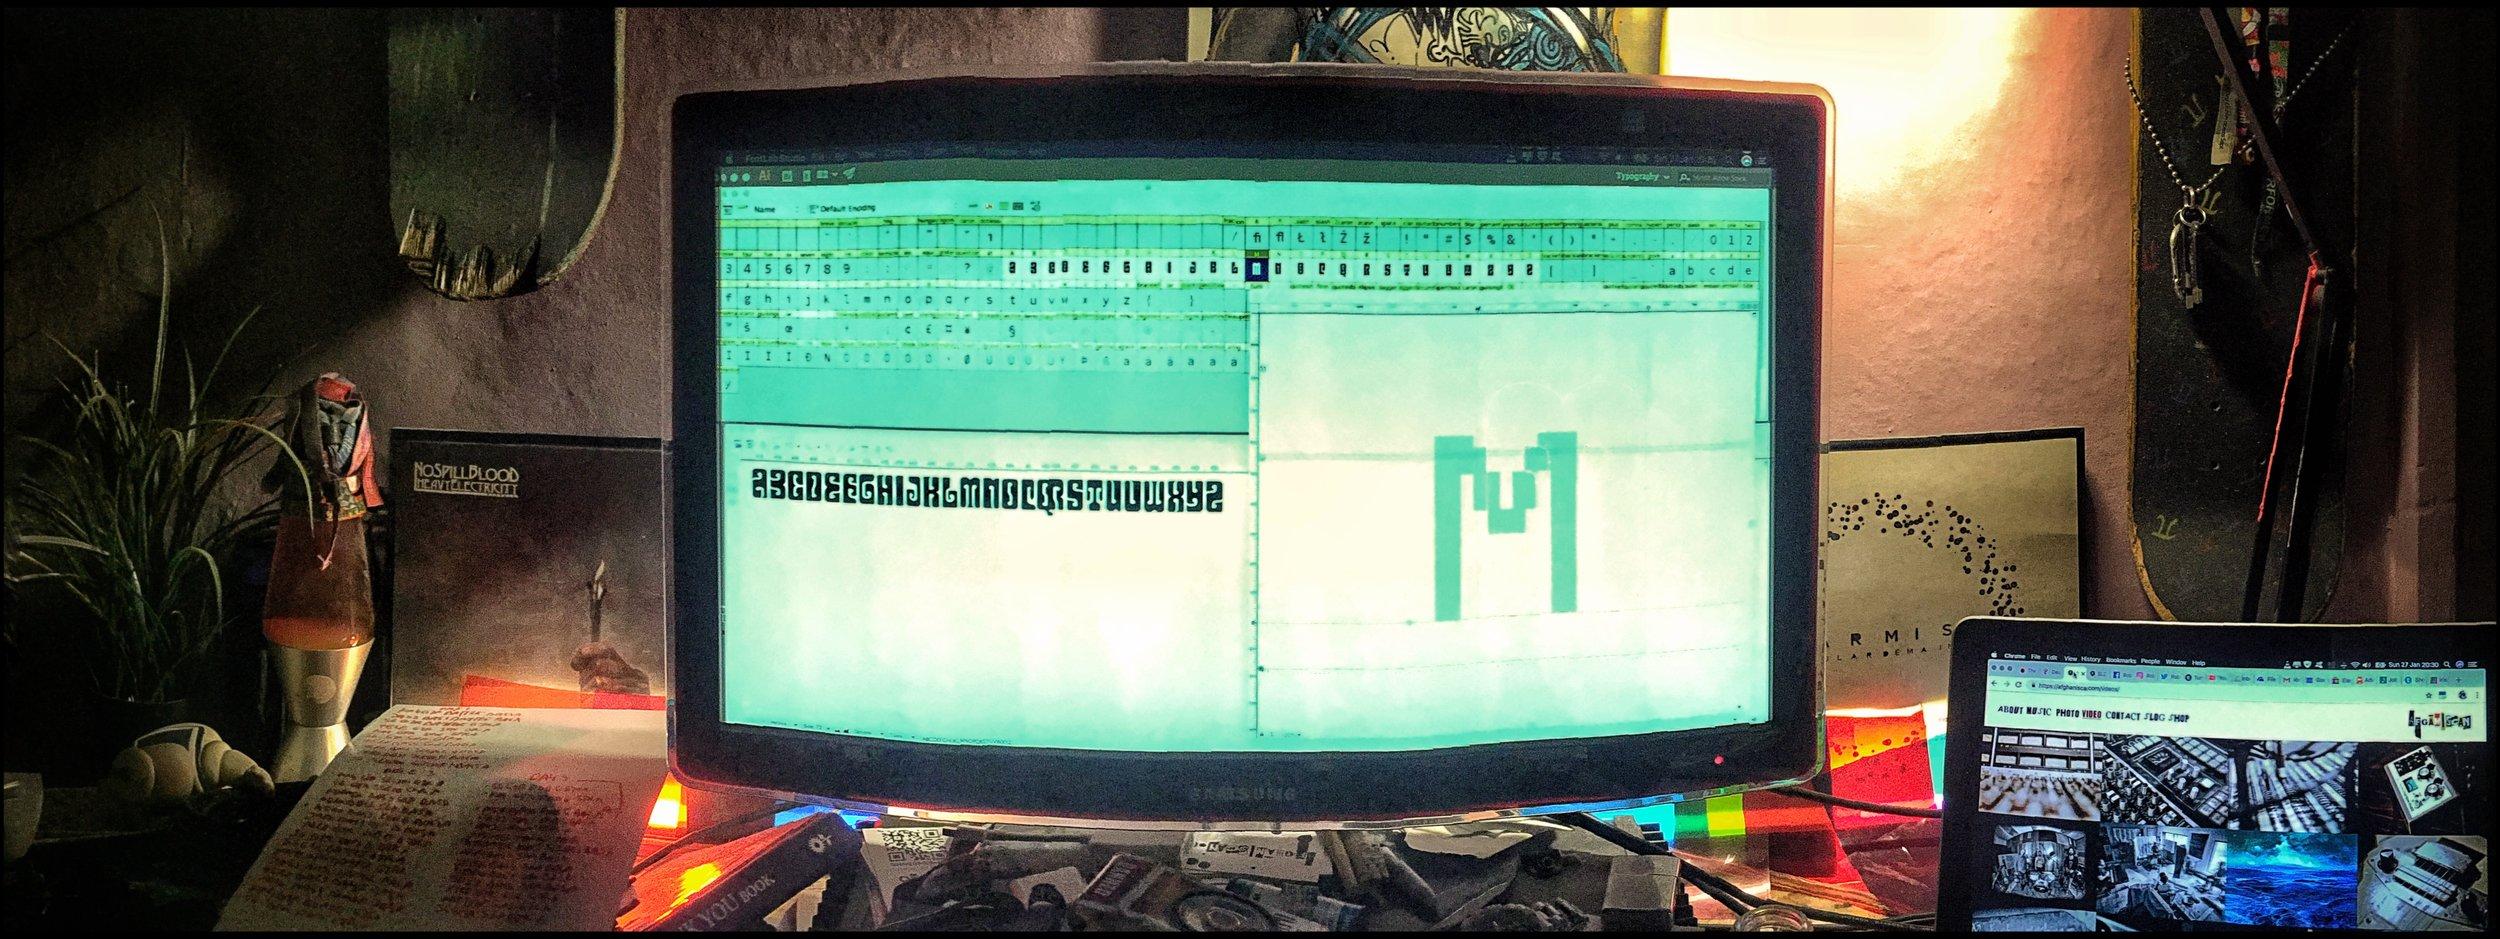 Moose Electronics TTF